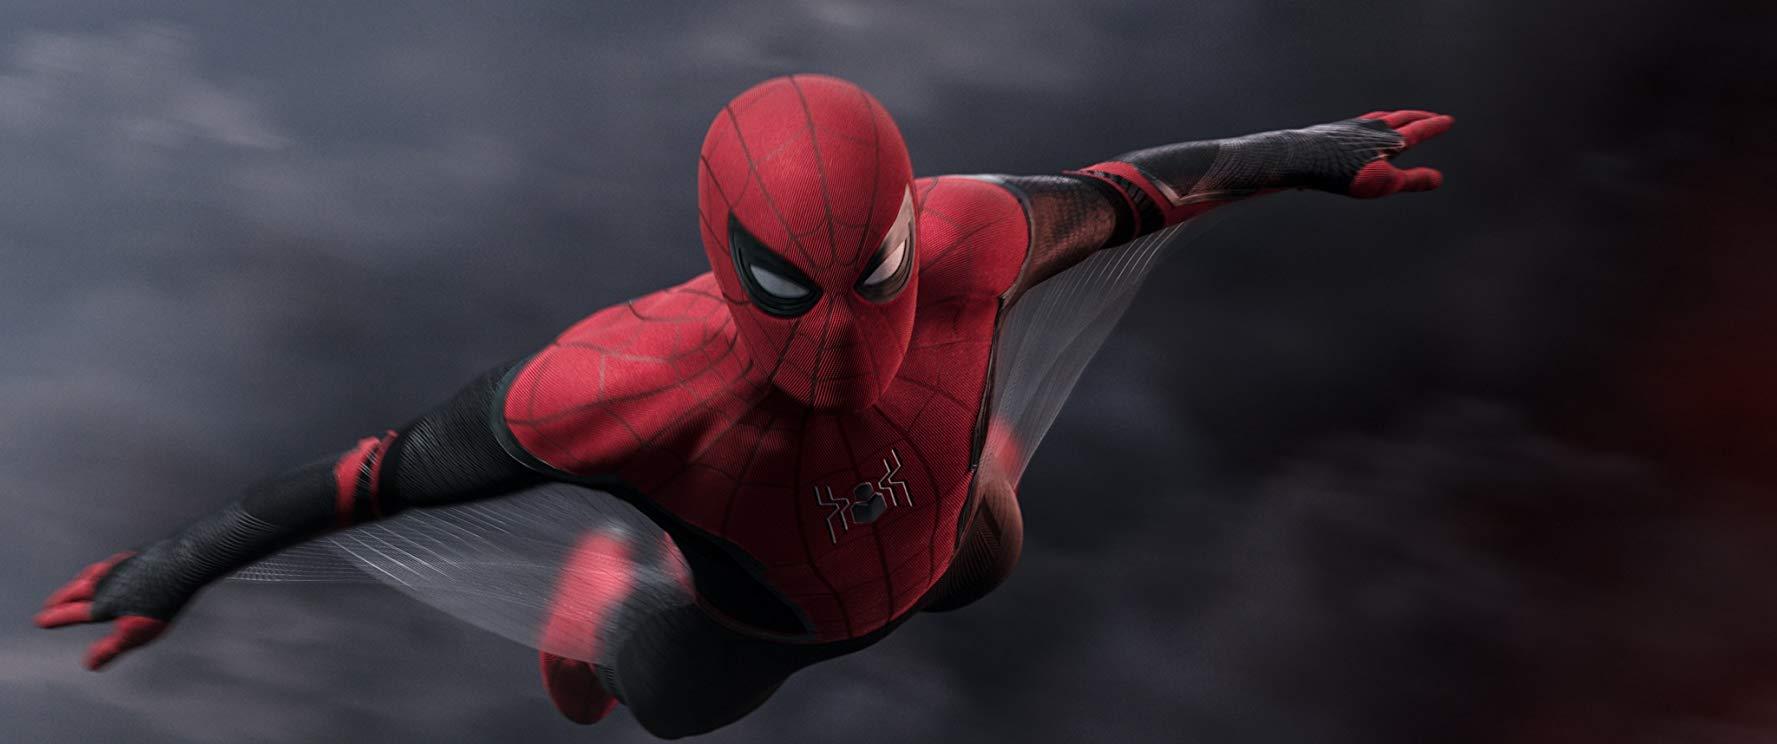 Film 'Spider-Man' Tinggalkan Marvel Cinematic Universe